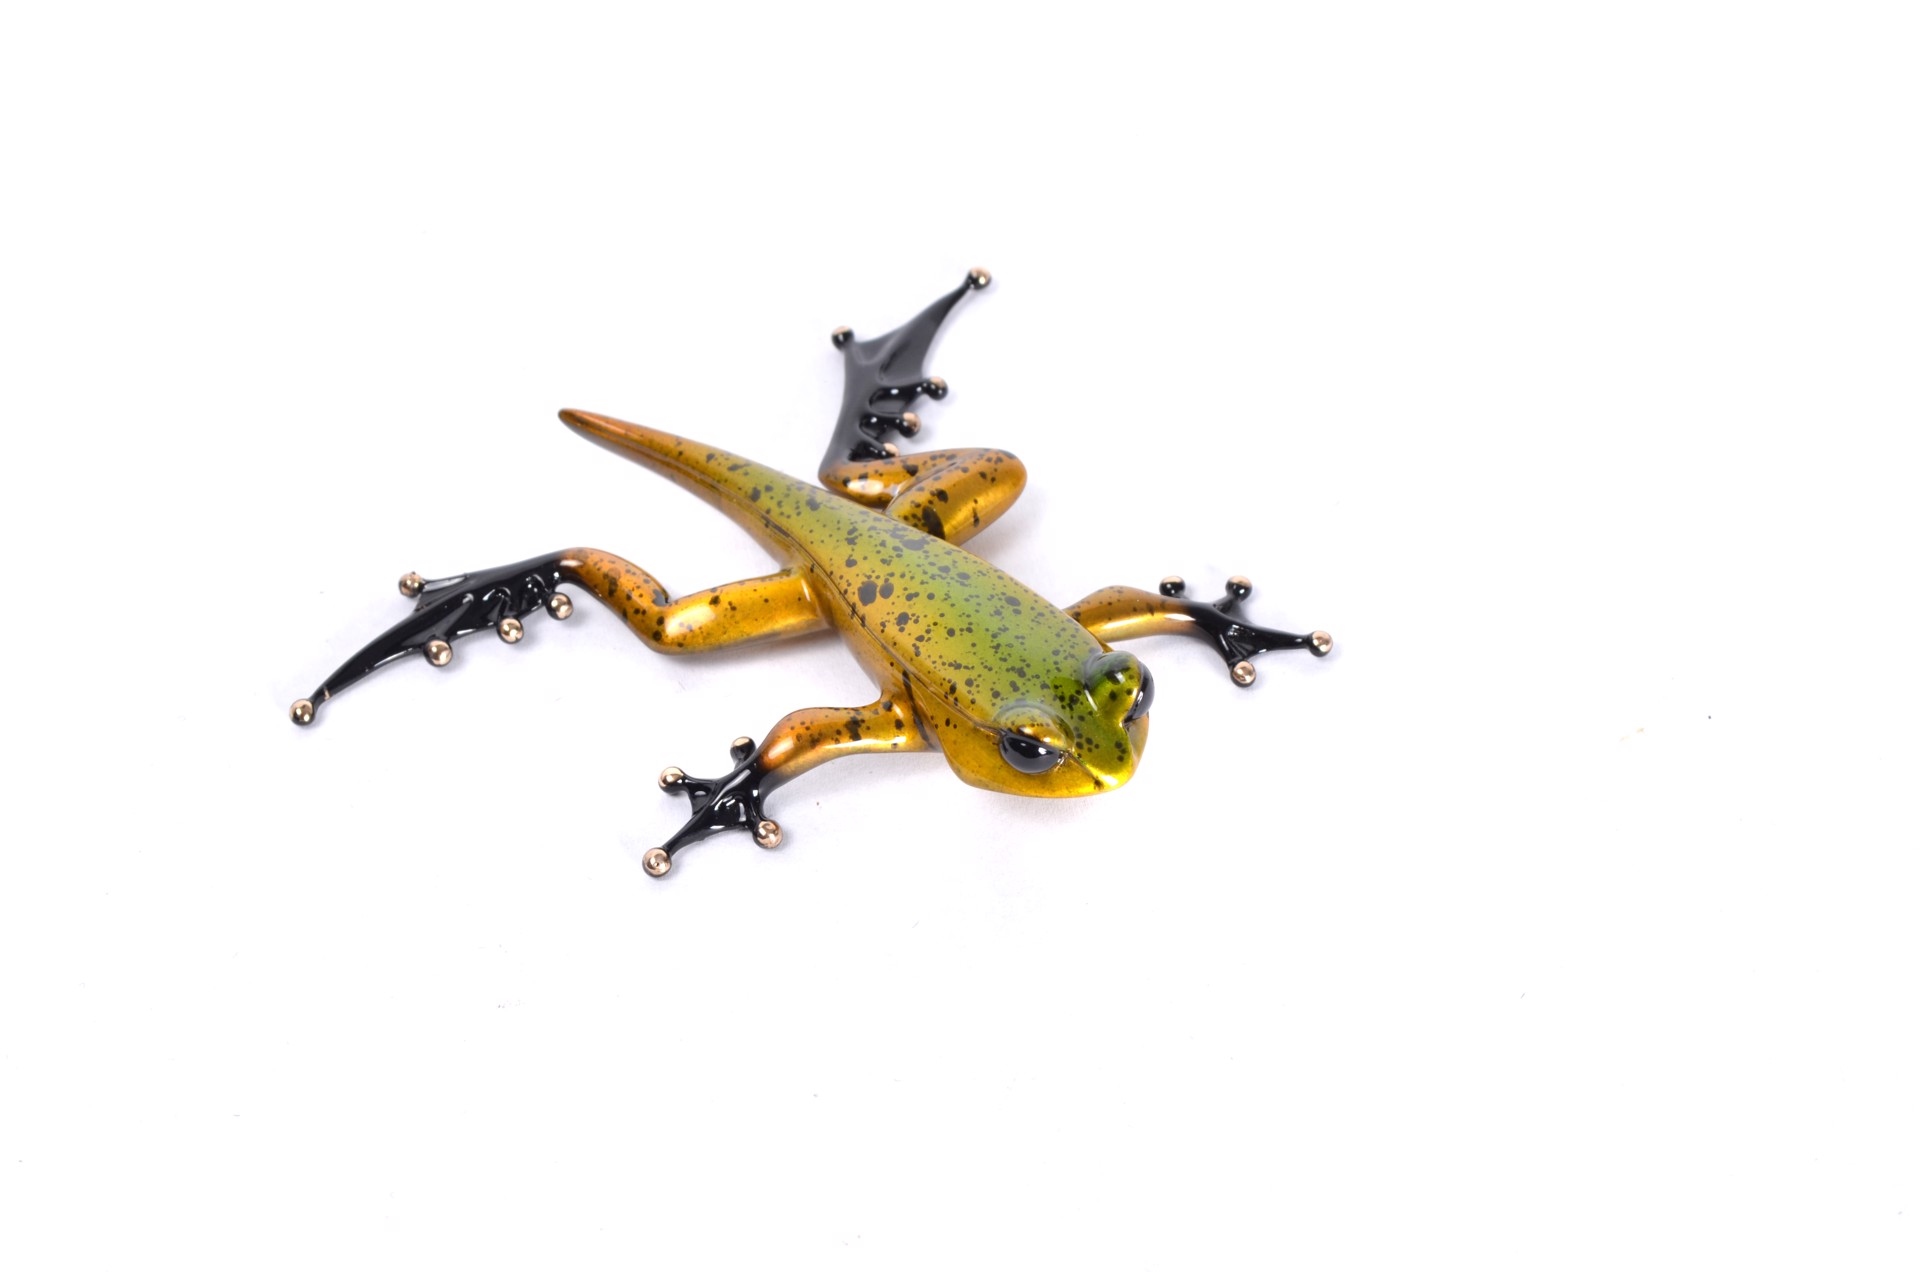 Froglet BF241 by Tim Cotterill